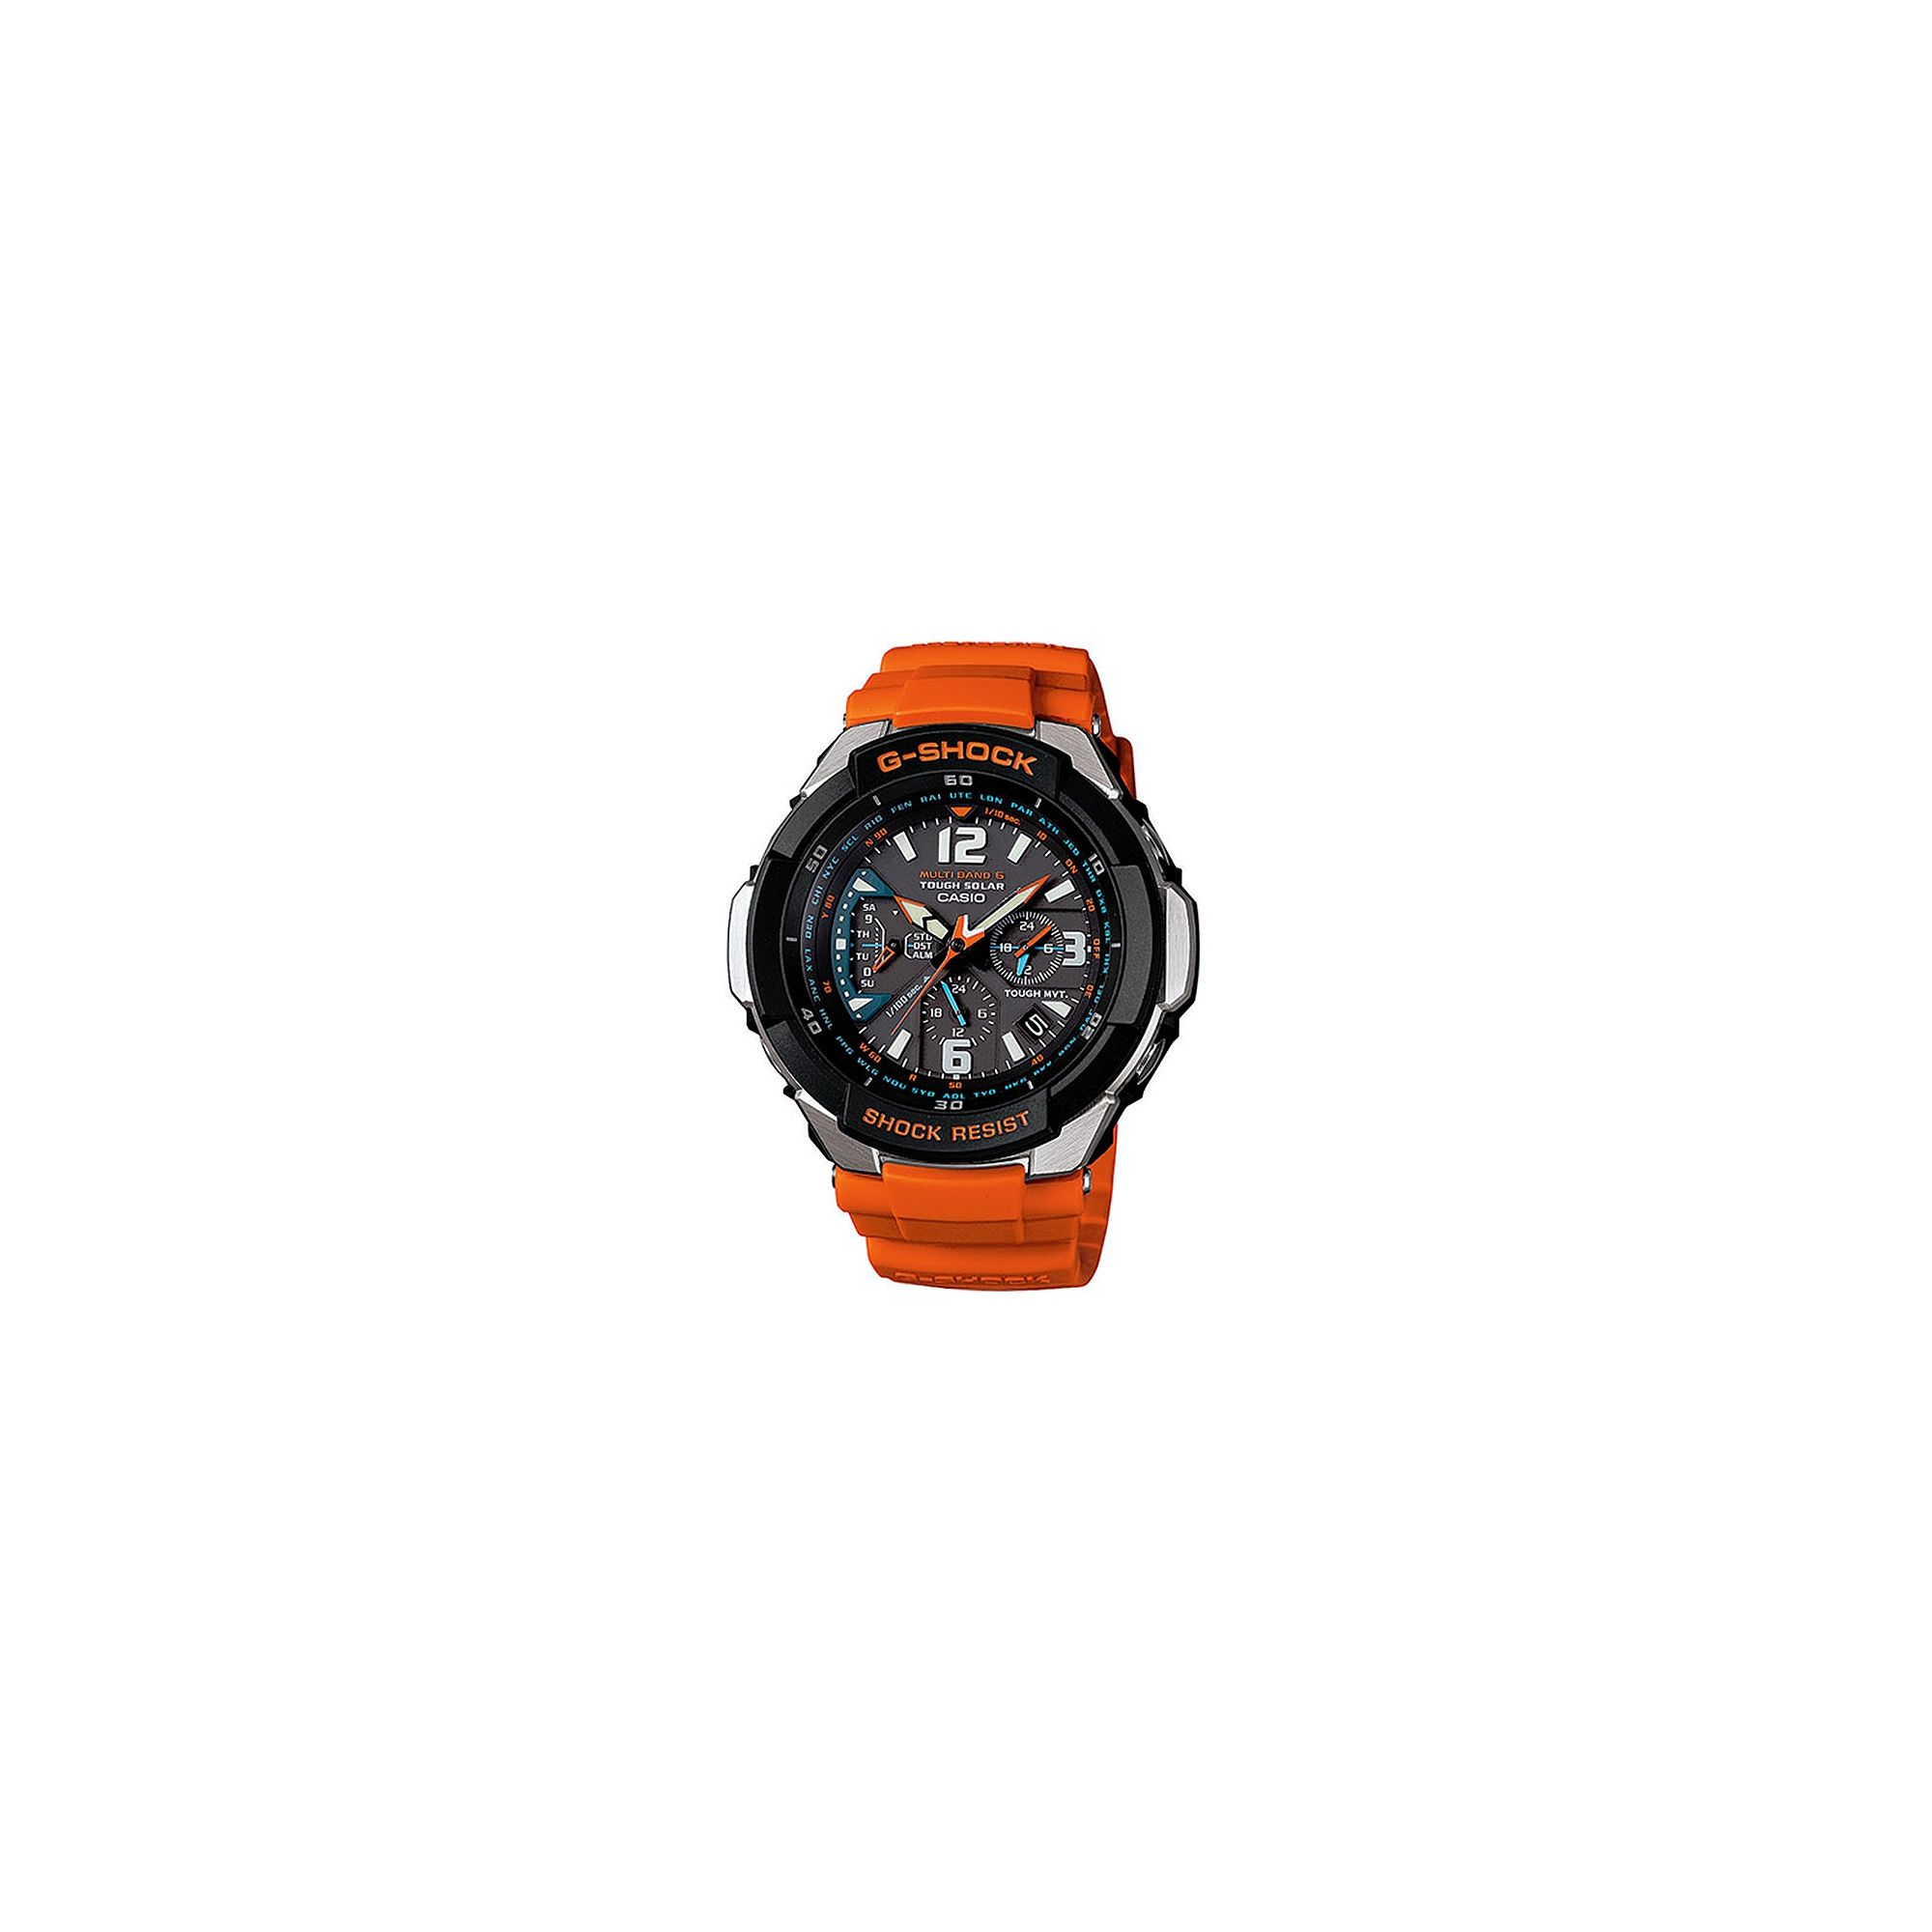 Casio G-Shock Chrono Watch GW-3000M-4AER at Tesco Direct